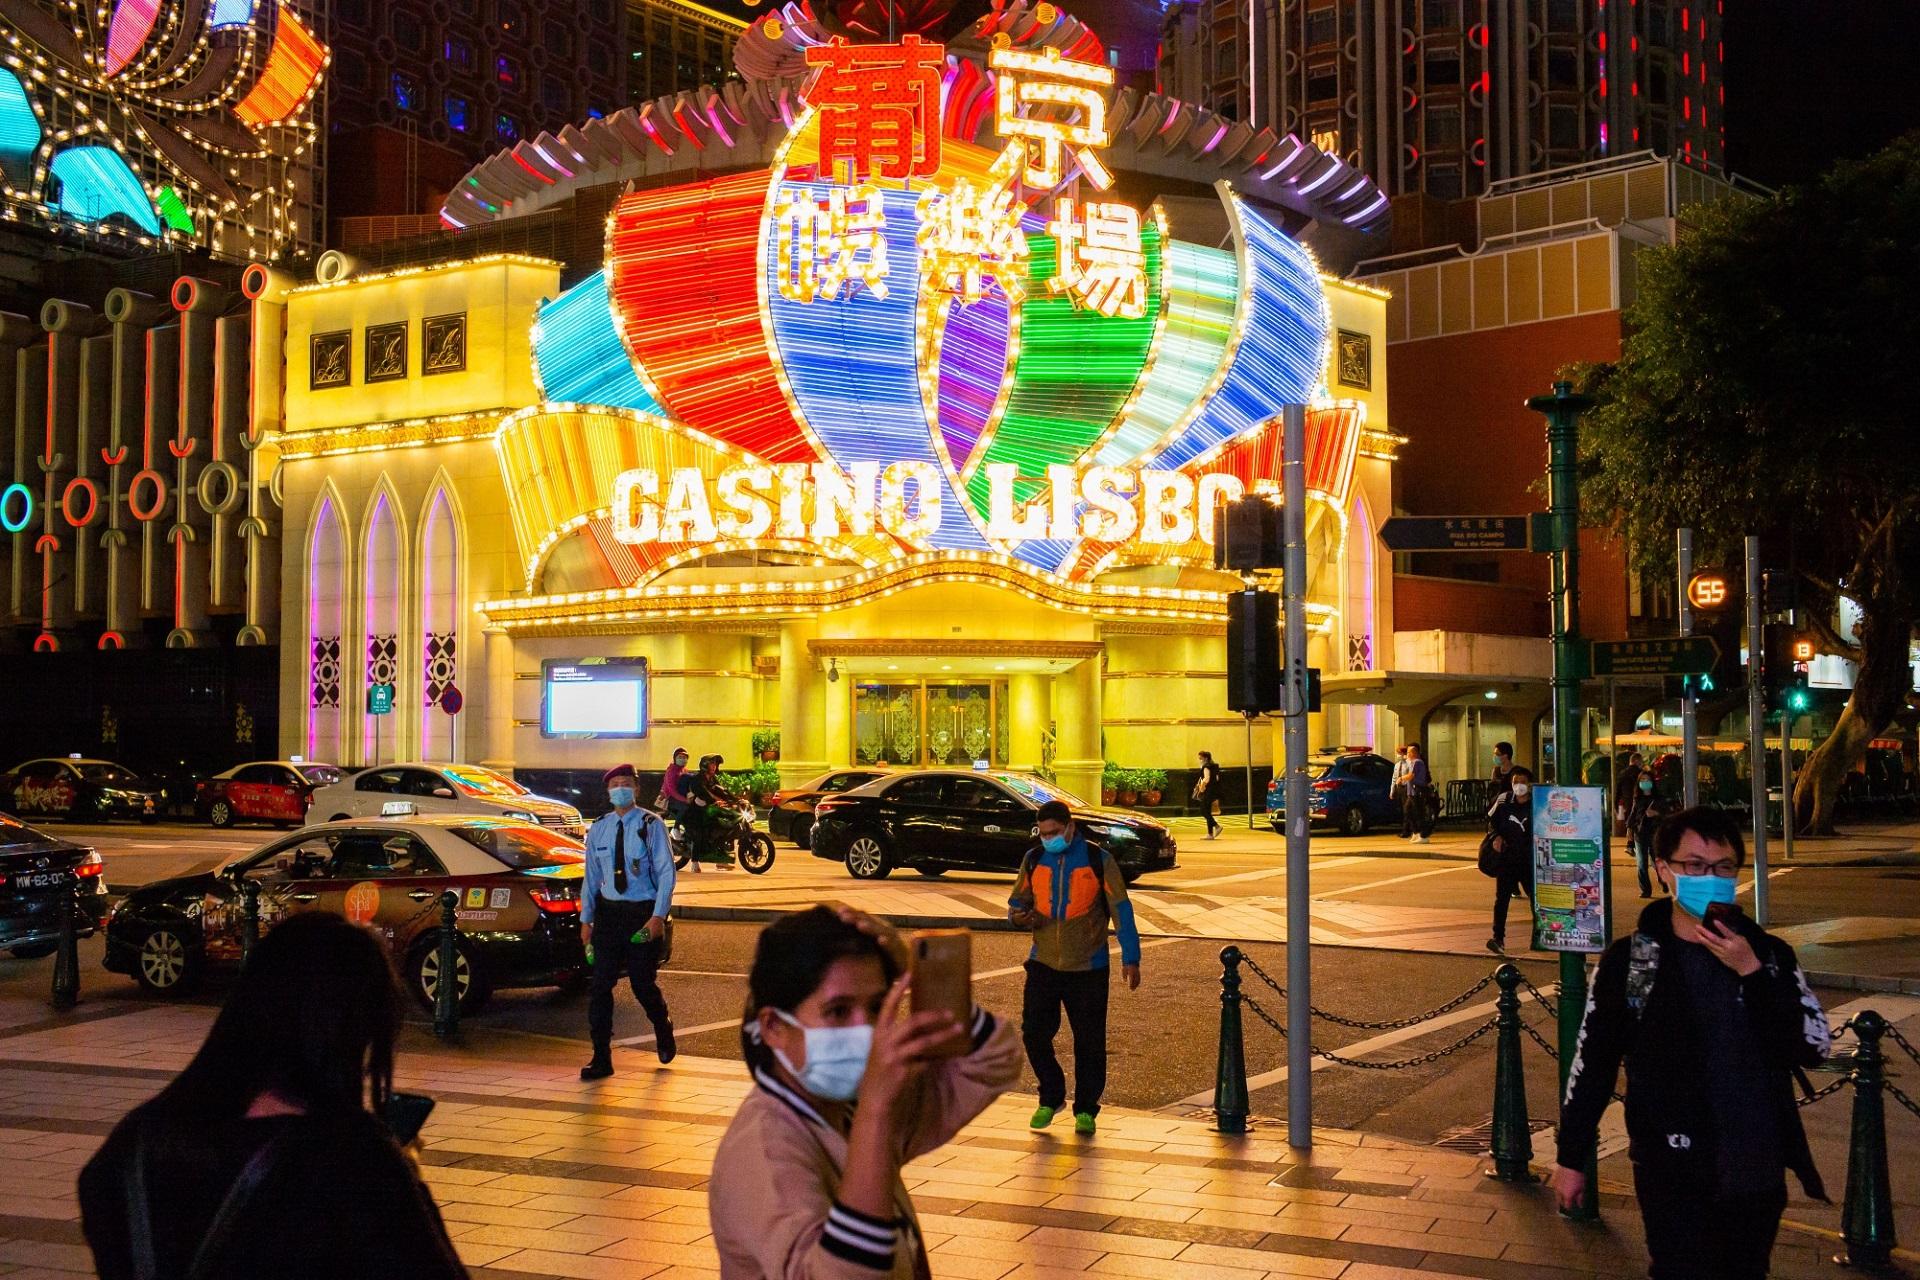 Casino Tourism And Its Economic Development-Macau